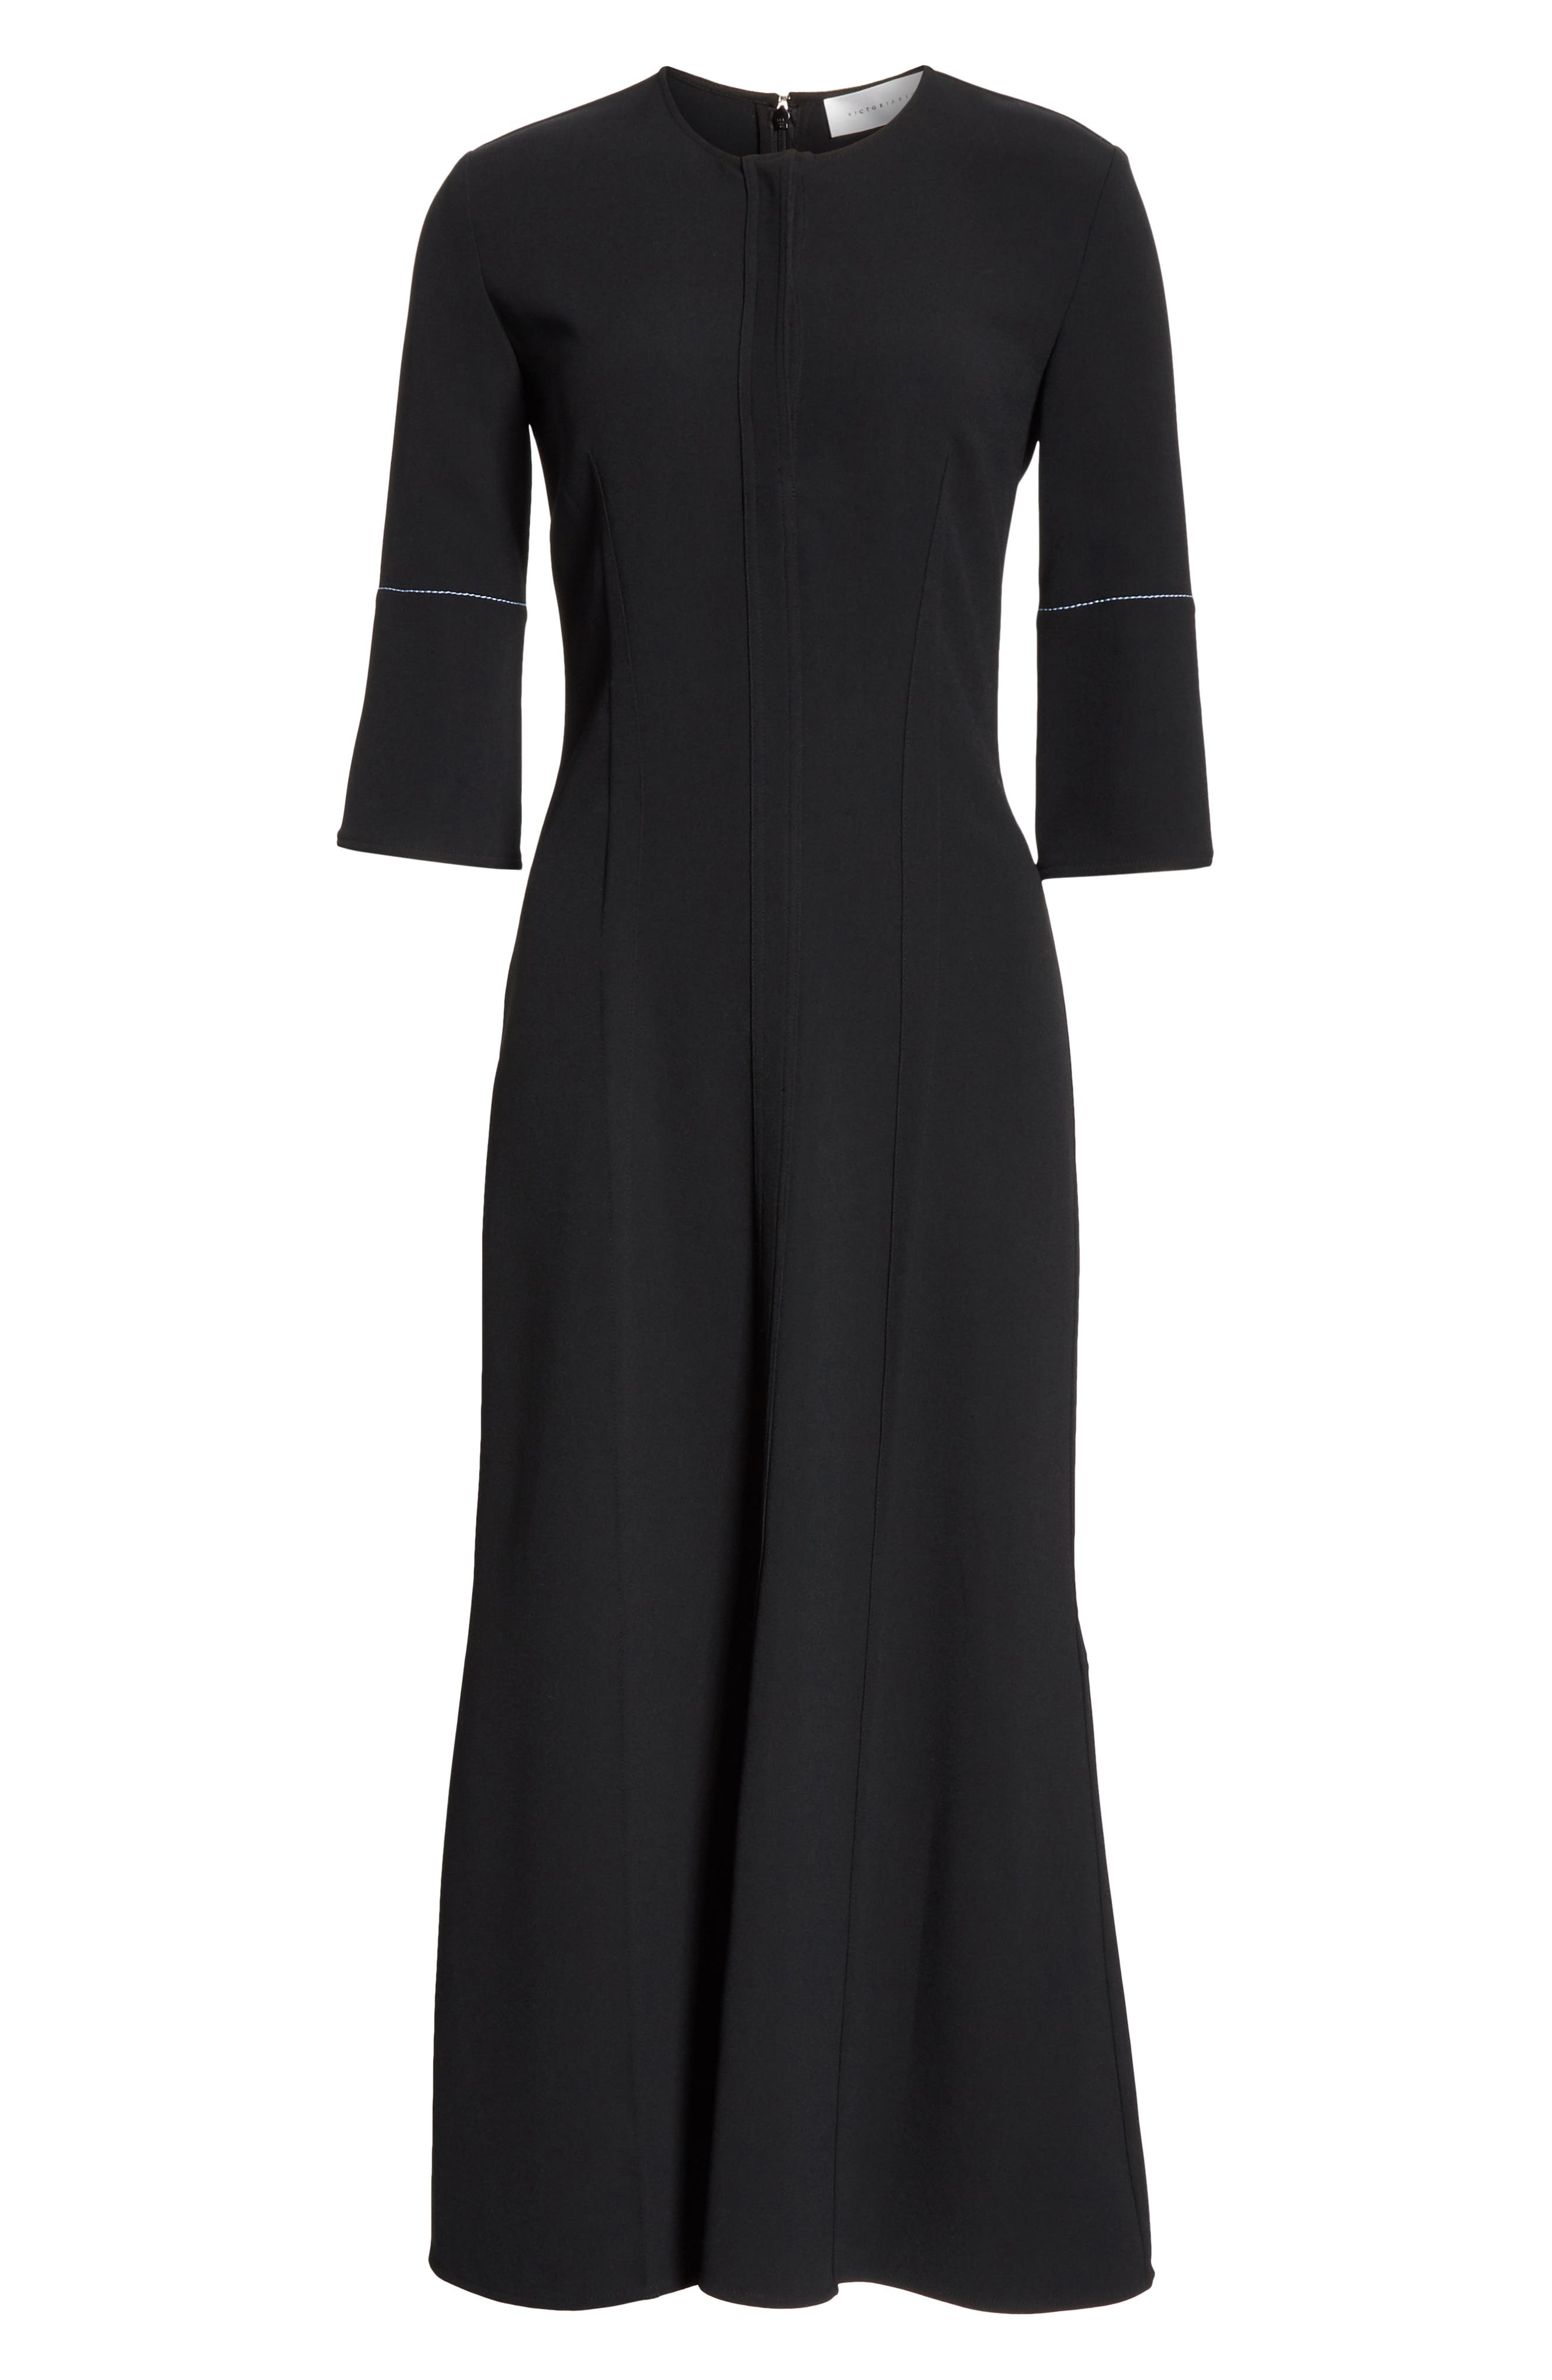 VICTORIA BECKHAM, Contrast Stitch Crepe Dress, Alternate thumbnail 7, color, BLACK